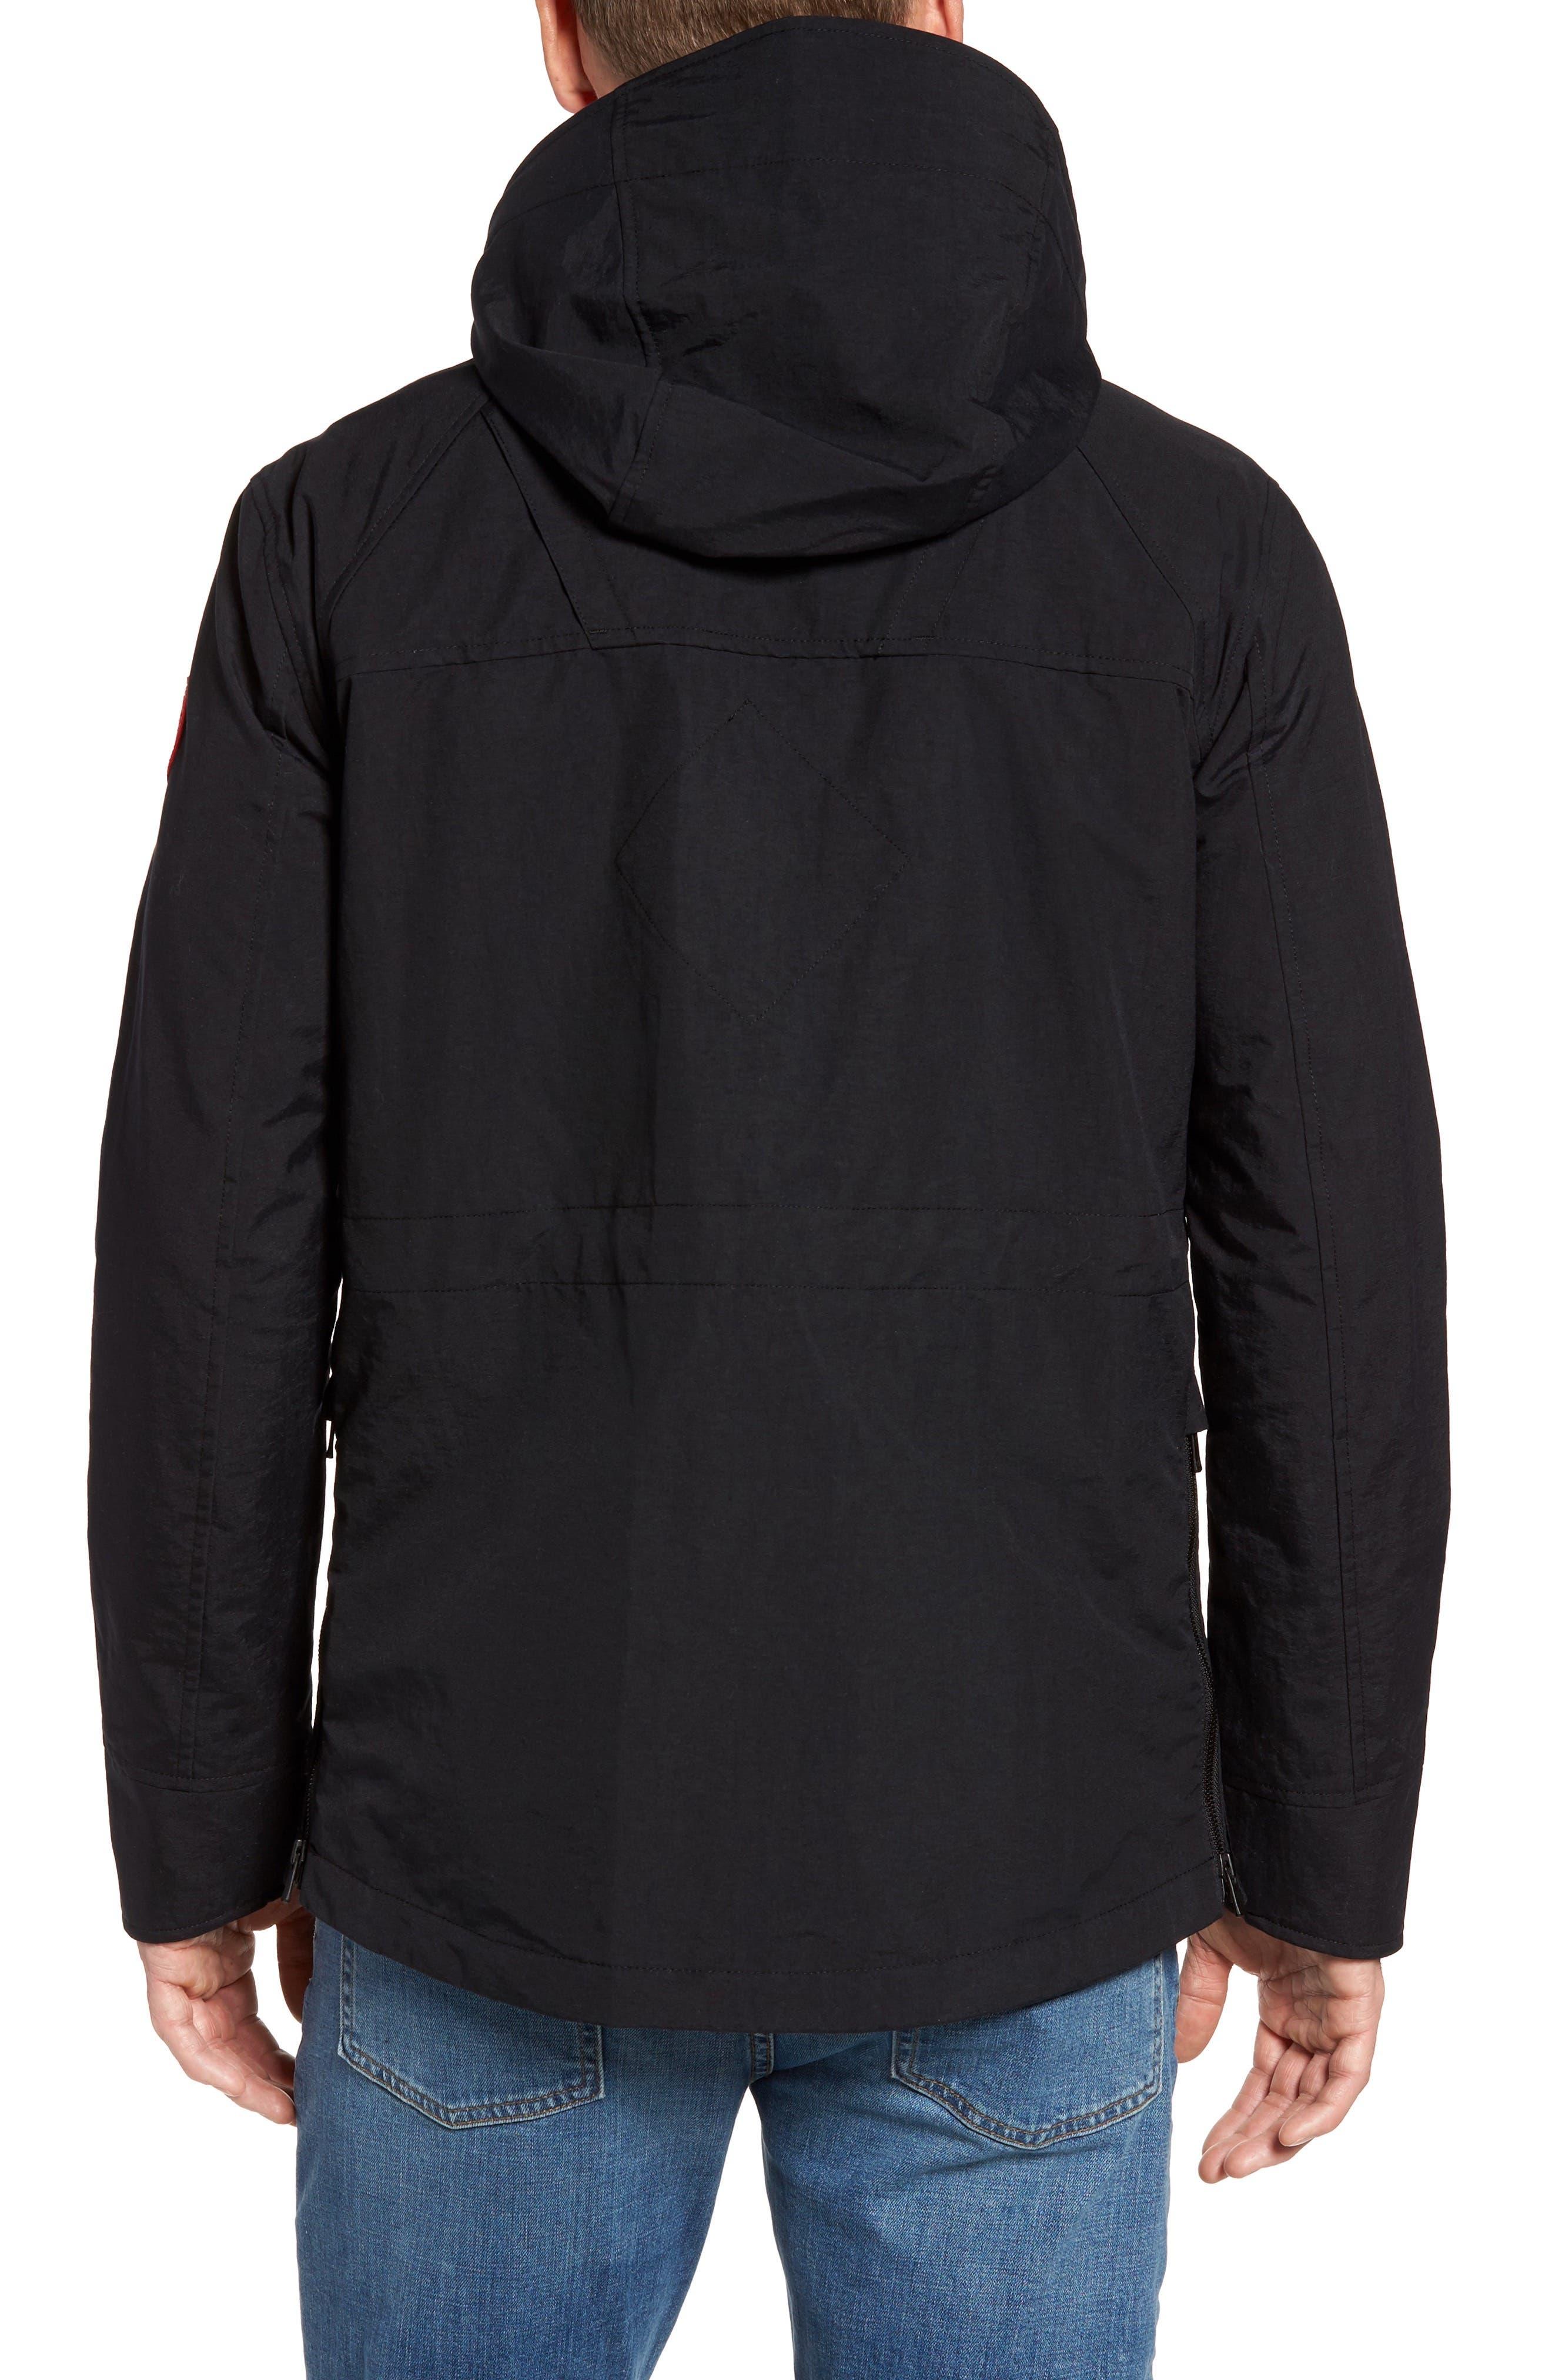 CANADA GOOSE,                             Redstone Slim Fit Hooded Jacket,                             Alternate thumbnail 2, color,                             001